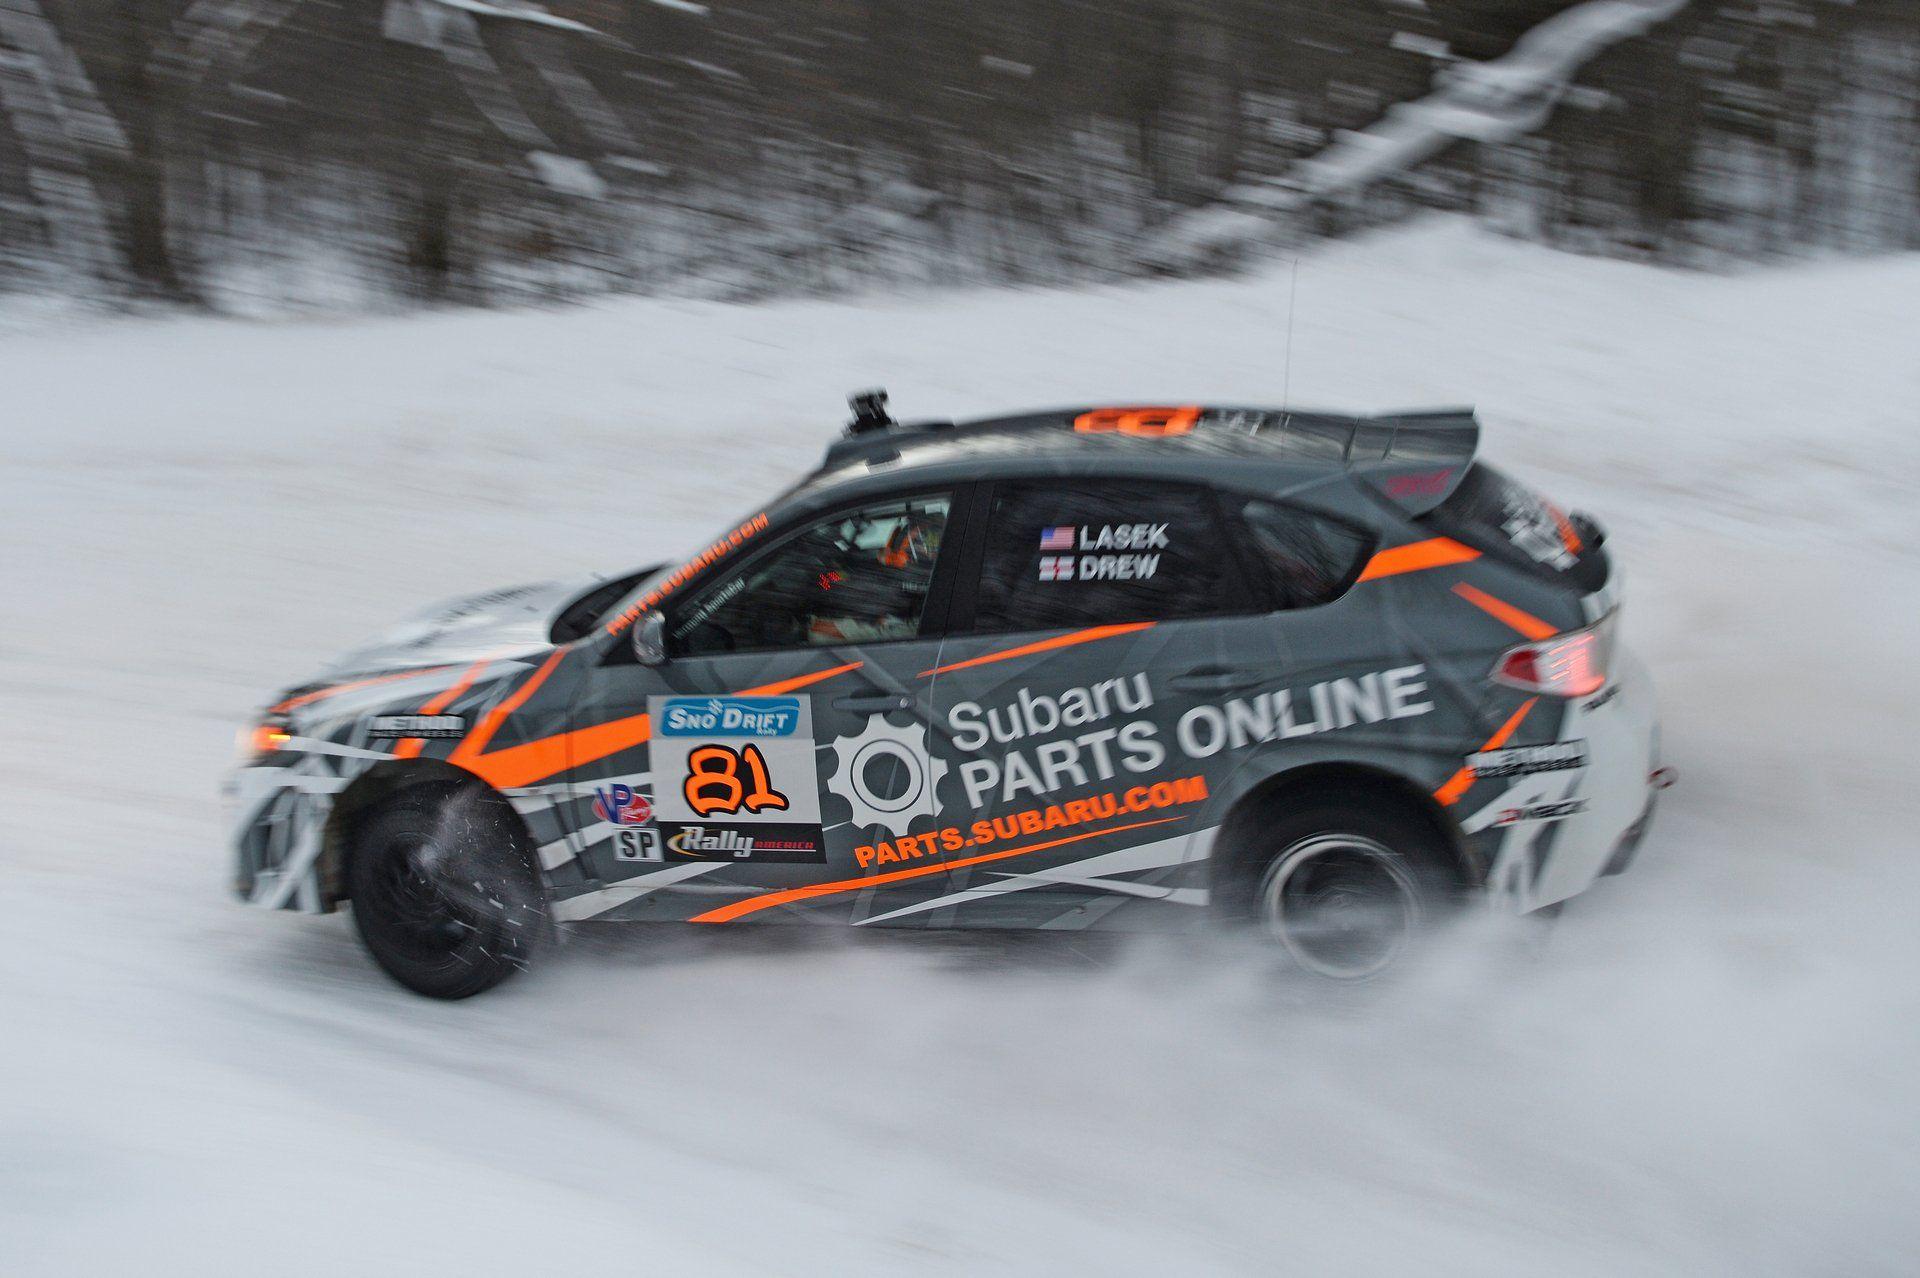 Subaru Rally Team USA announced today that team driver Bucky Lasek ...